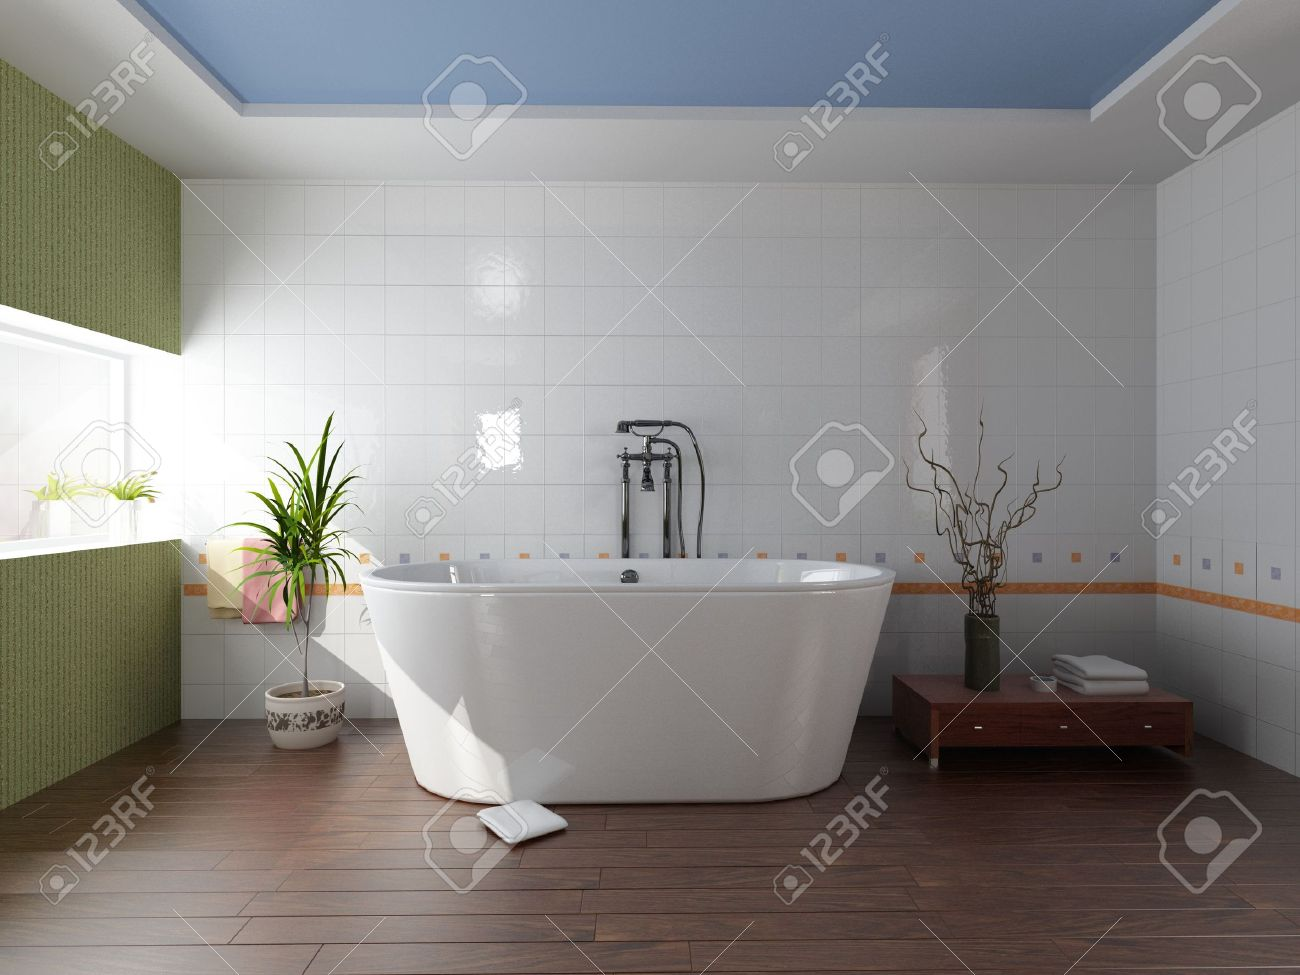 bagno moderno con vasca (rendering 3d) foto royalty free, immagini ... - Bagni Moderni Con Vasca